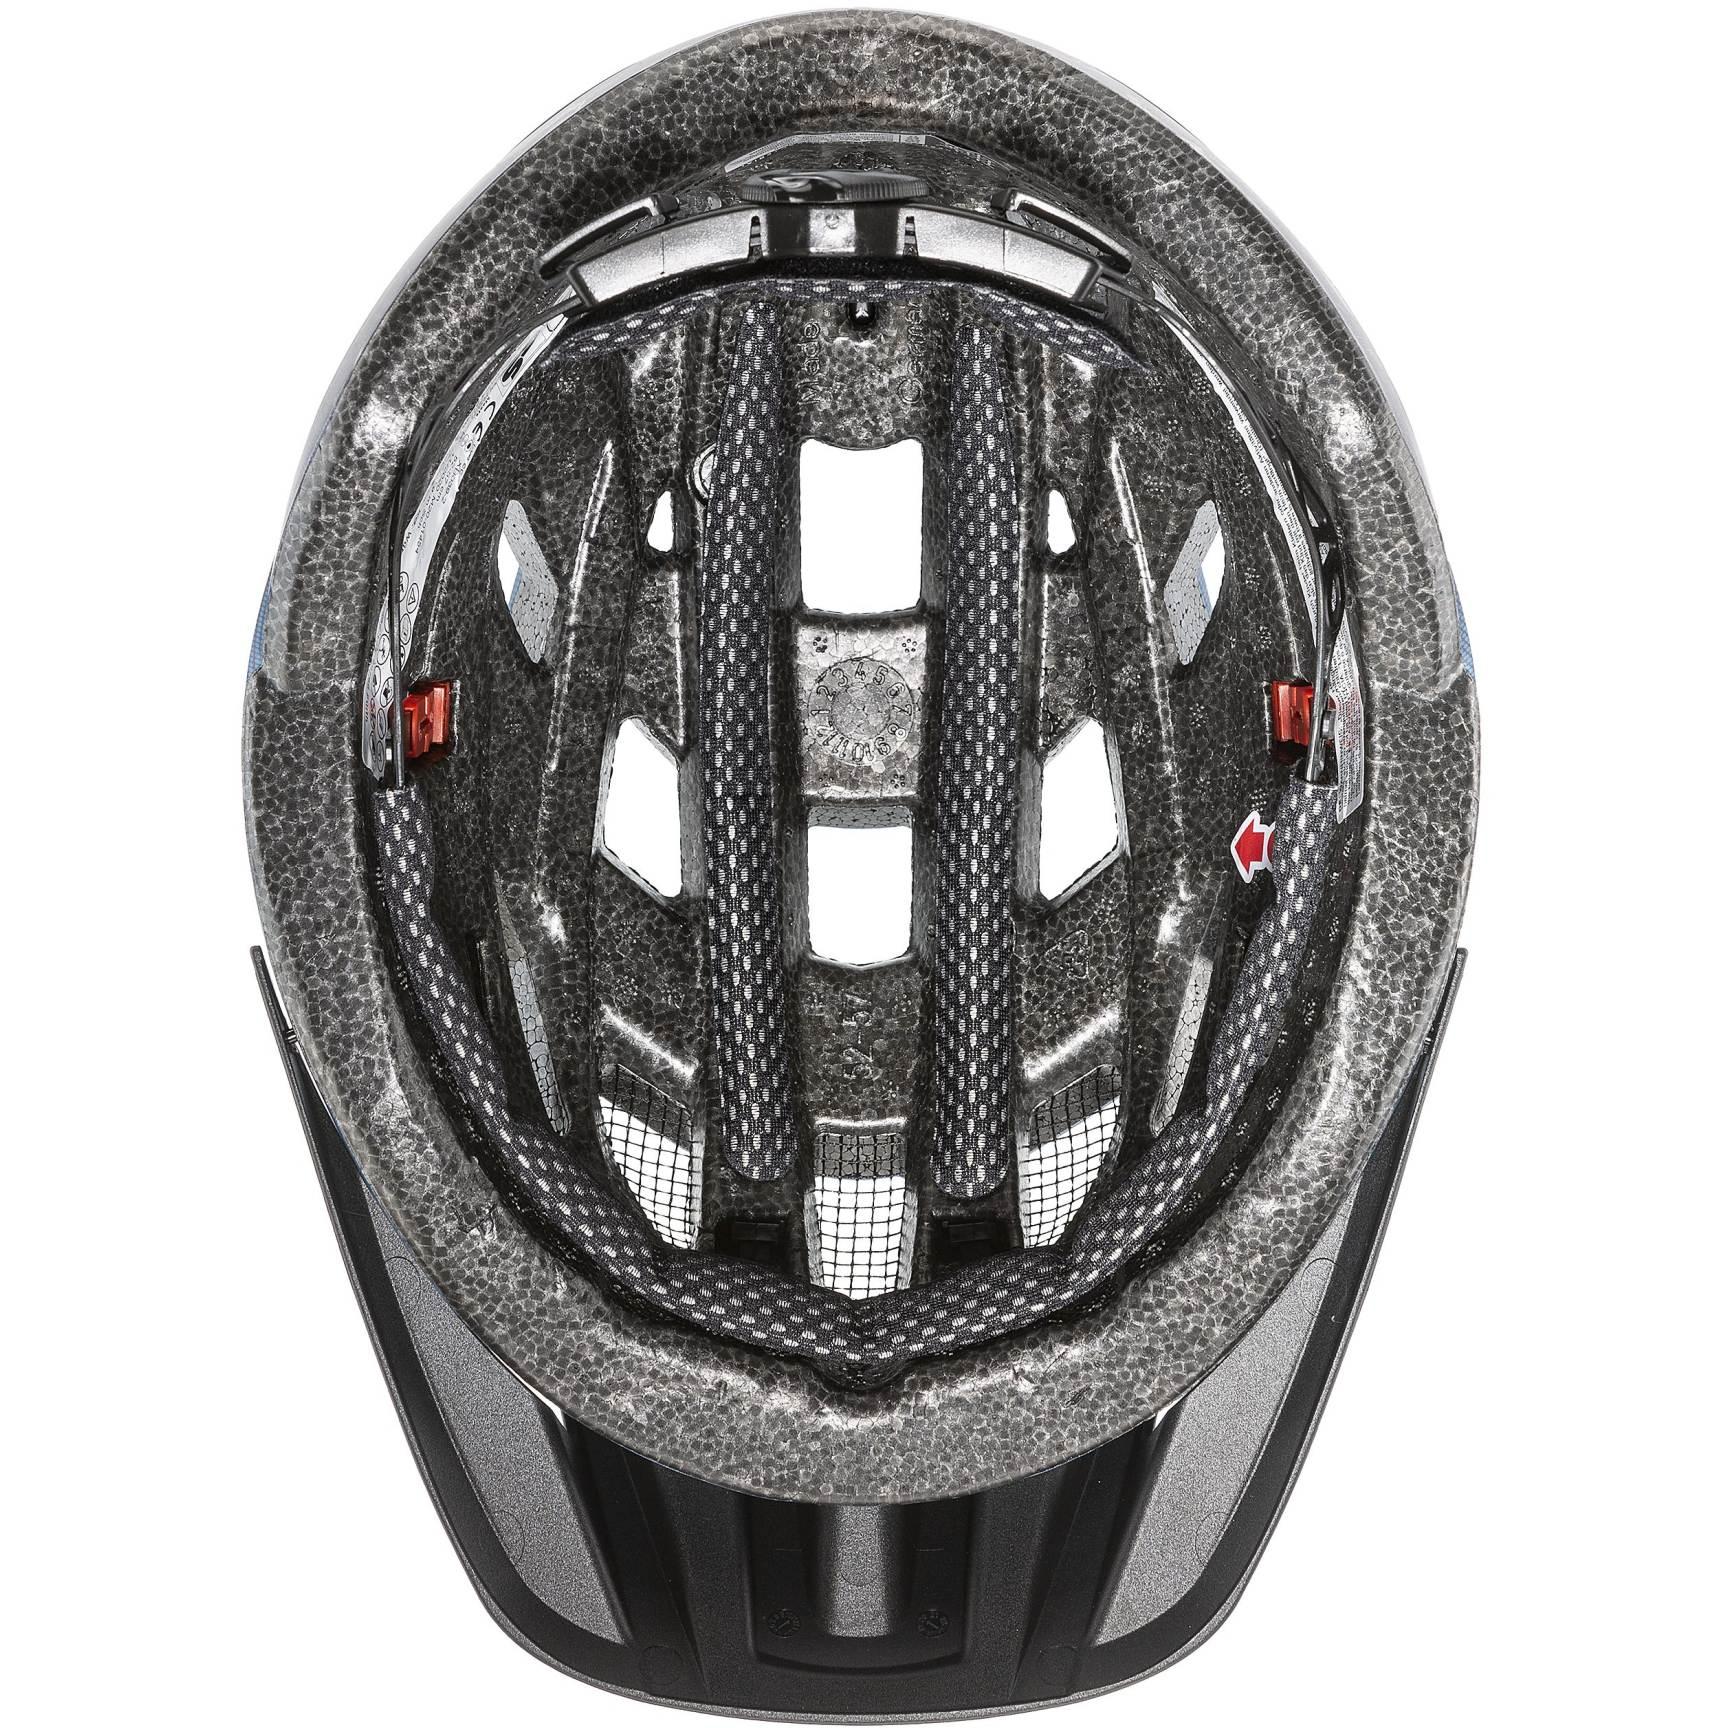 Image of Uvex i-vo cc Helmet - deep space mat